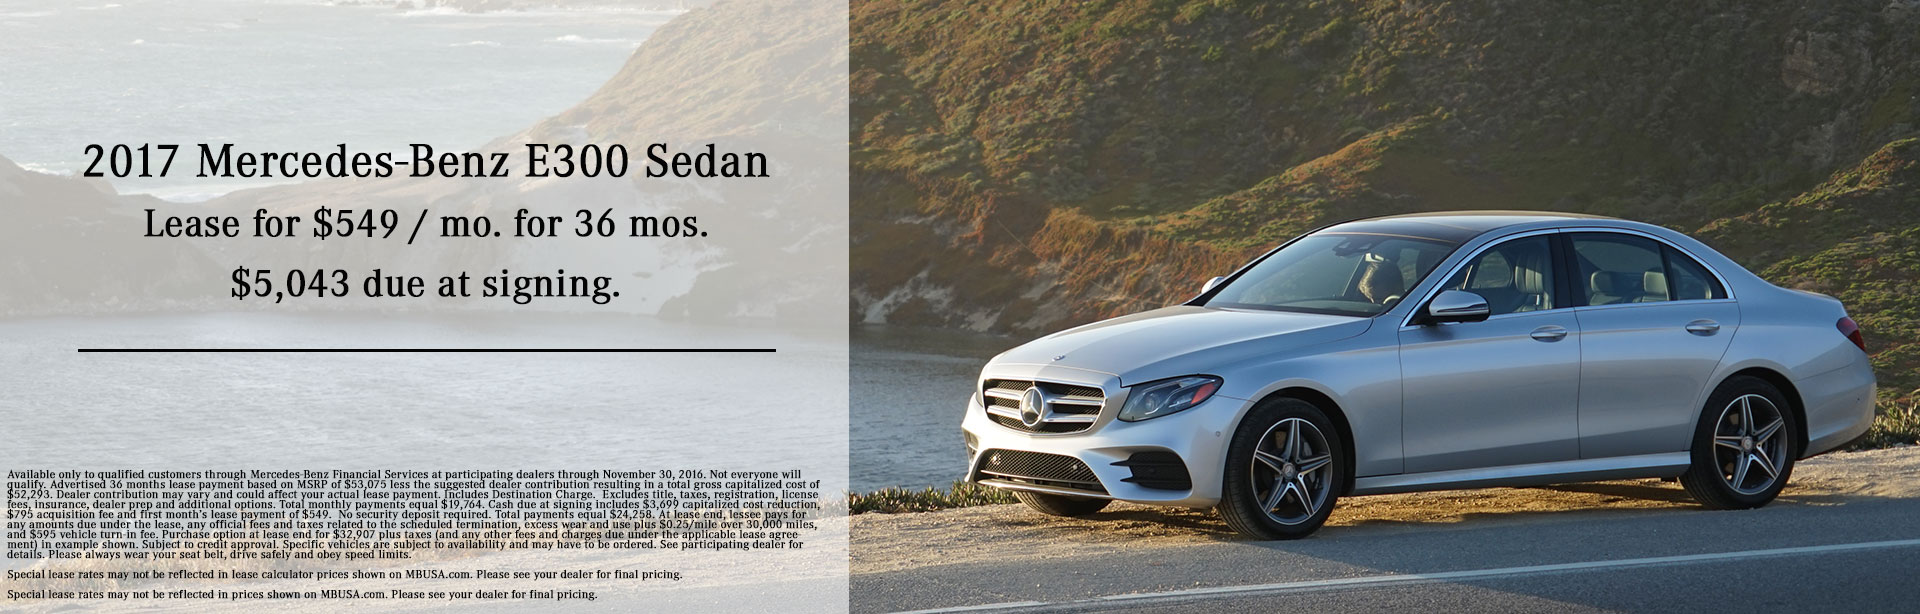 2017 mercedes benz e300 sedan lease special mercedes for Mercedes benz of memphis service